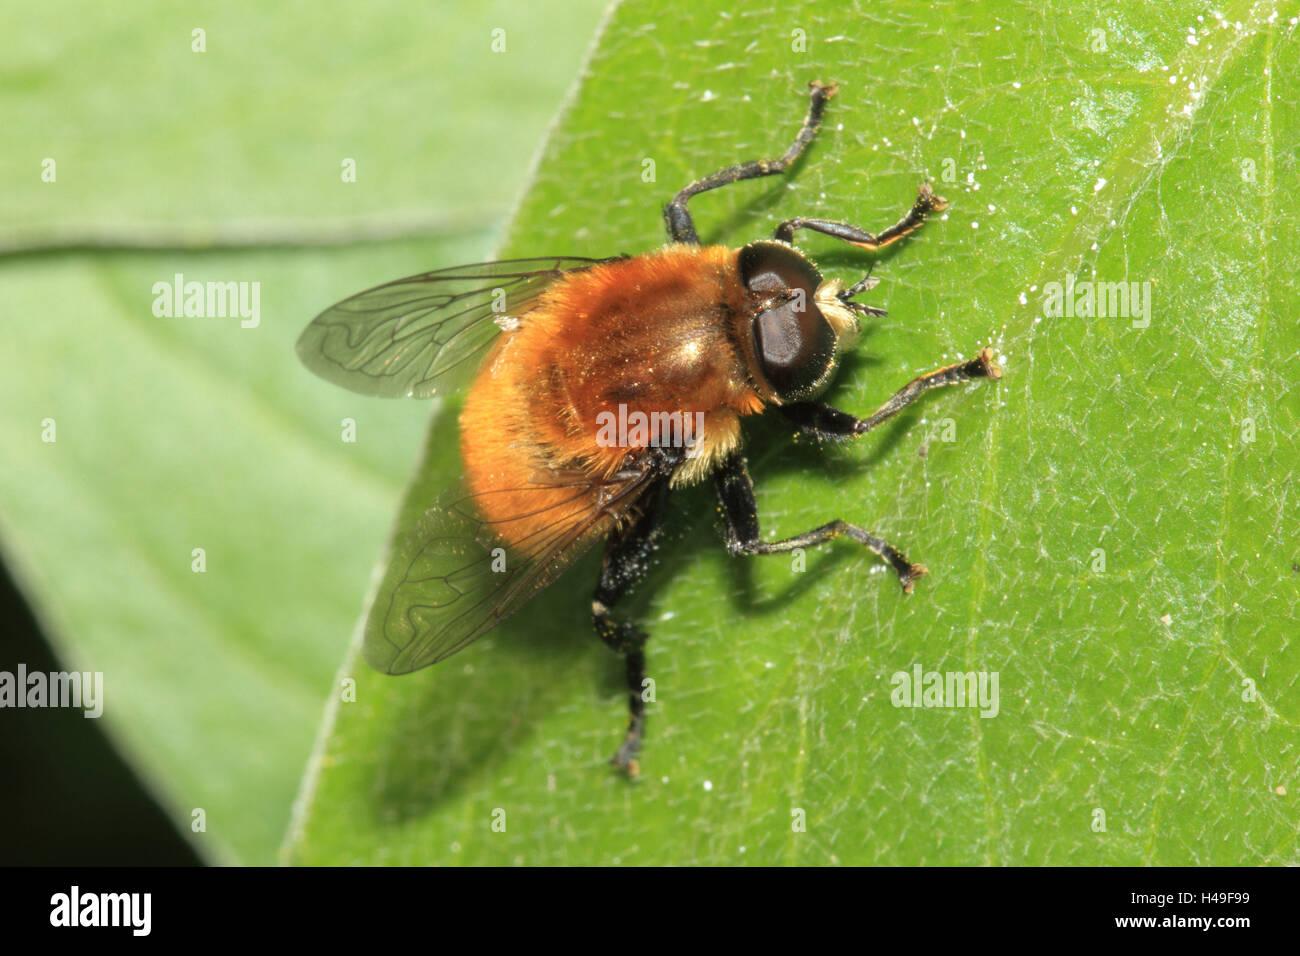 Yellow-hairy Hummelschwebfliege, leaves, medium close-up, landscape format, animal, wild animal, Hummelschwebfliege, - Stock Image